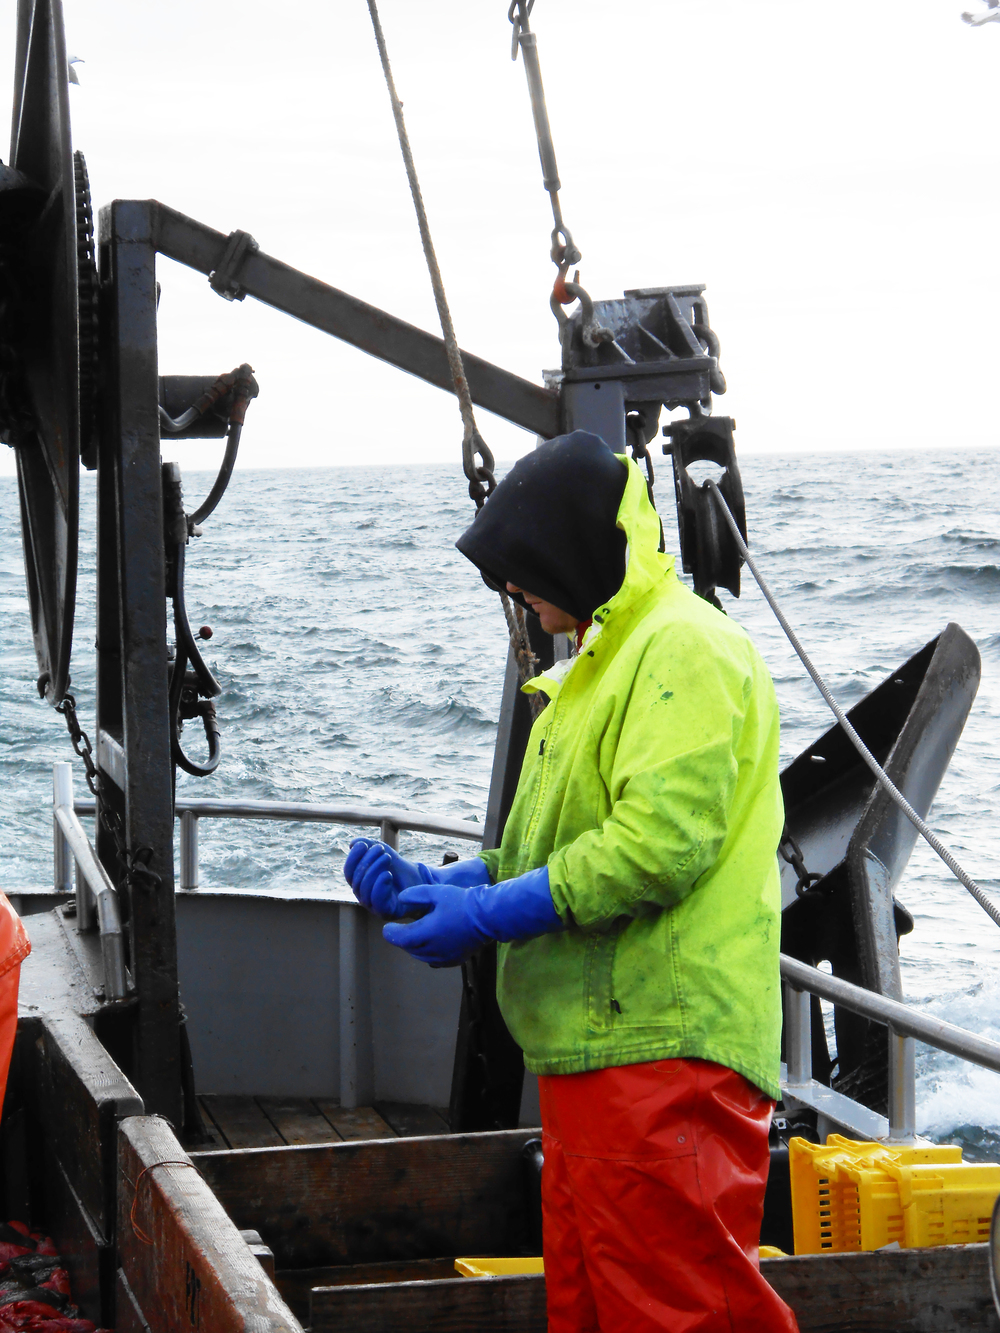 Fisherman-1.jpg